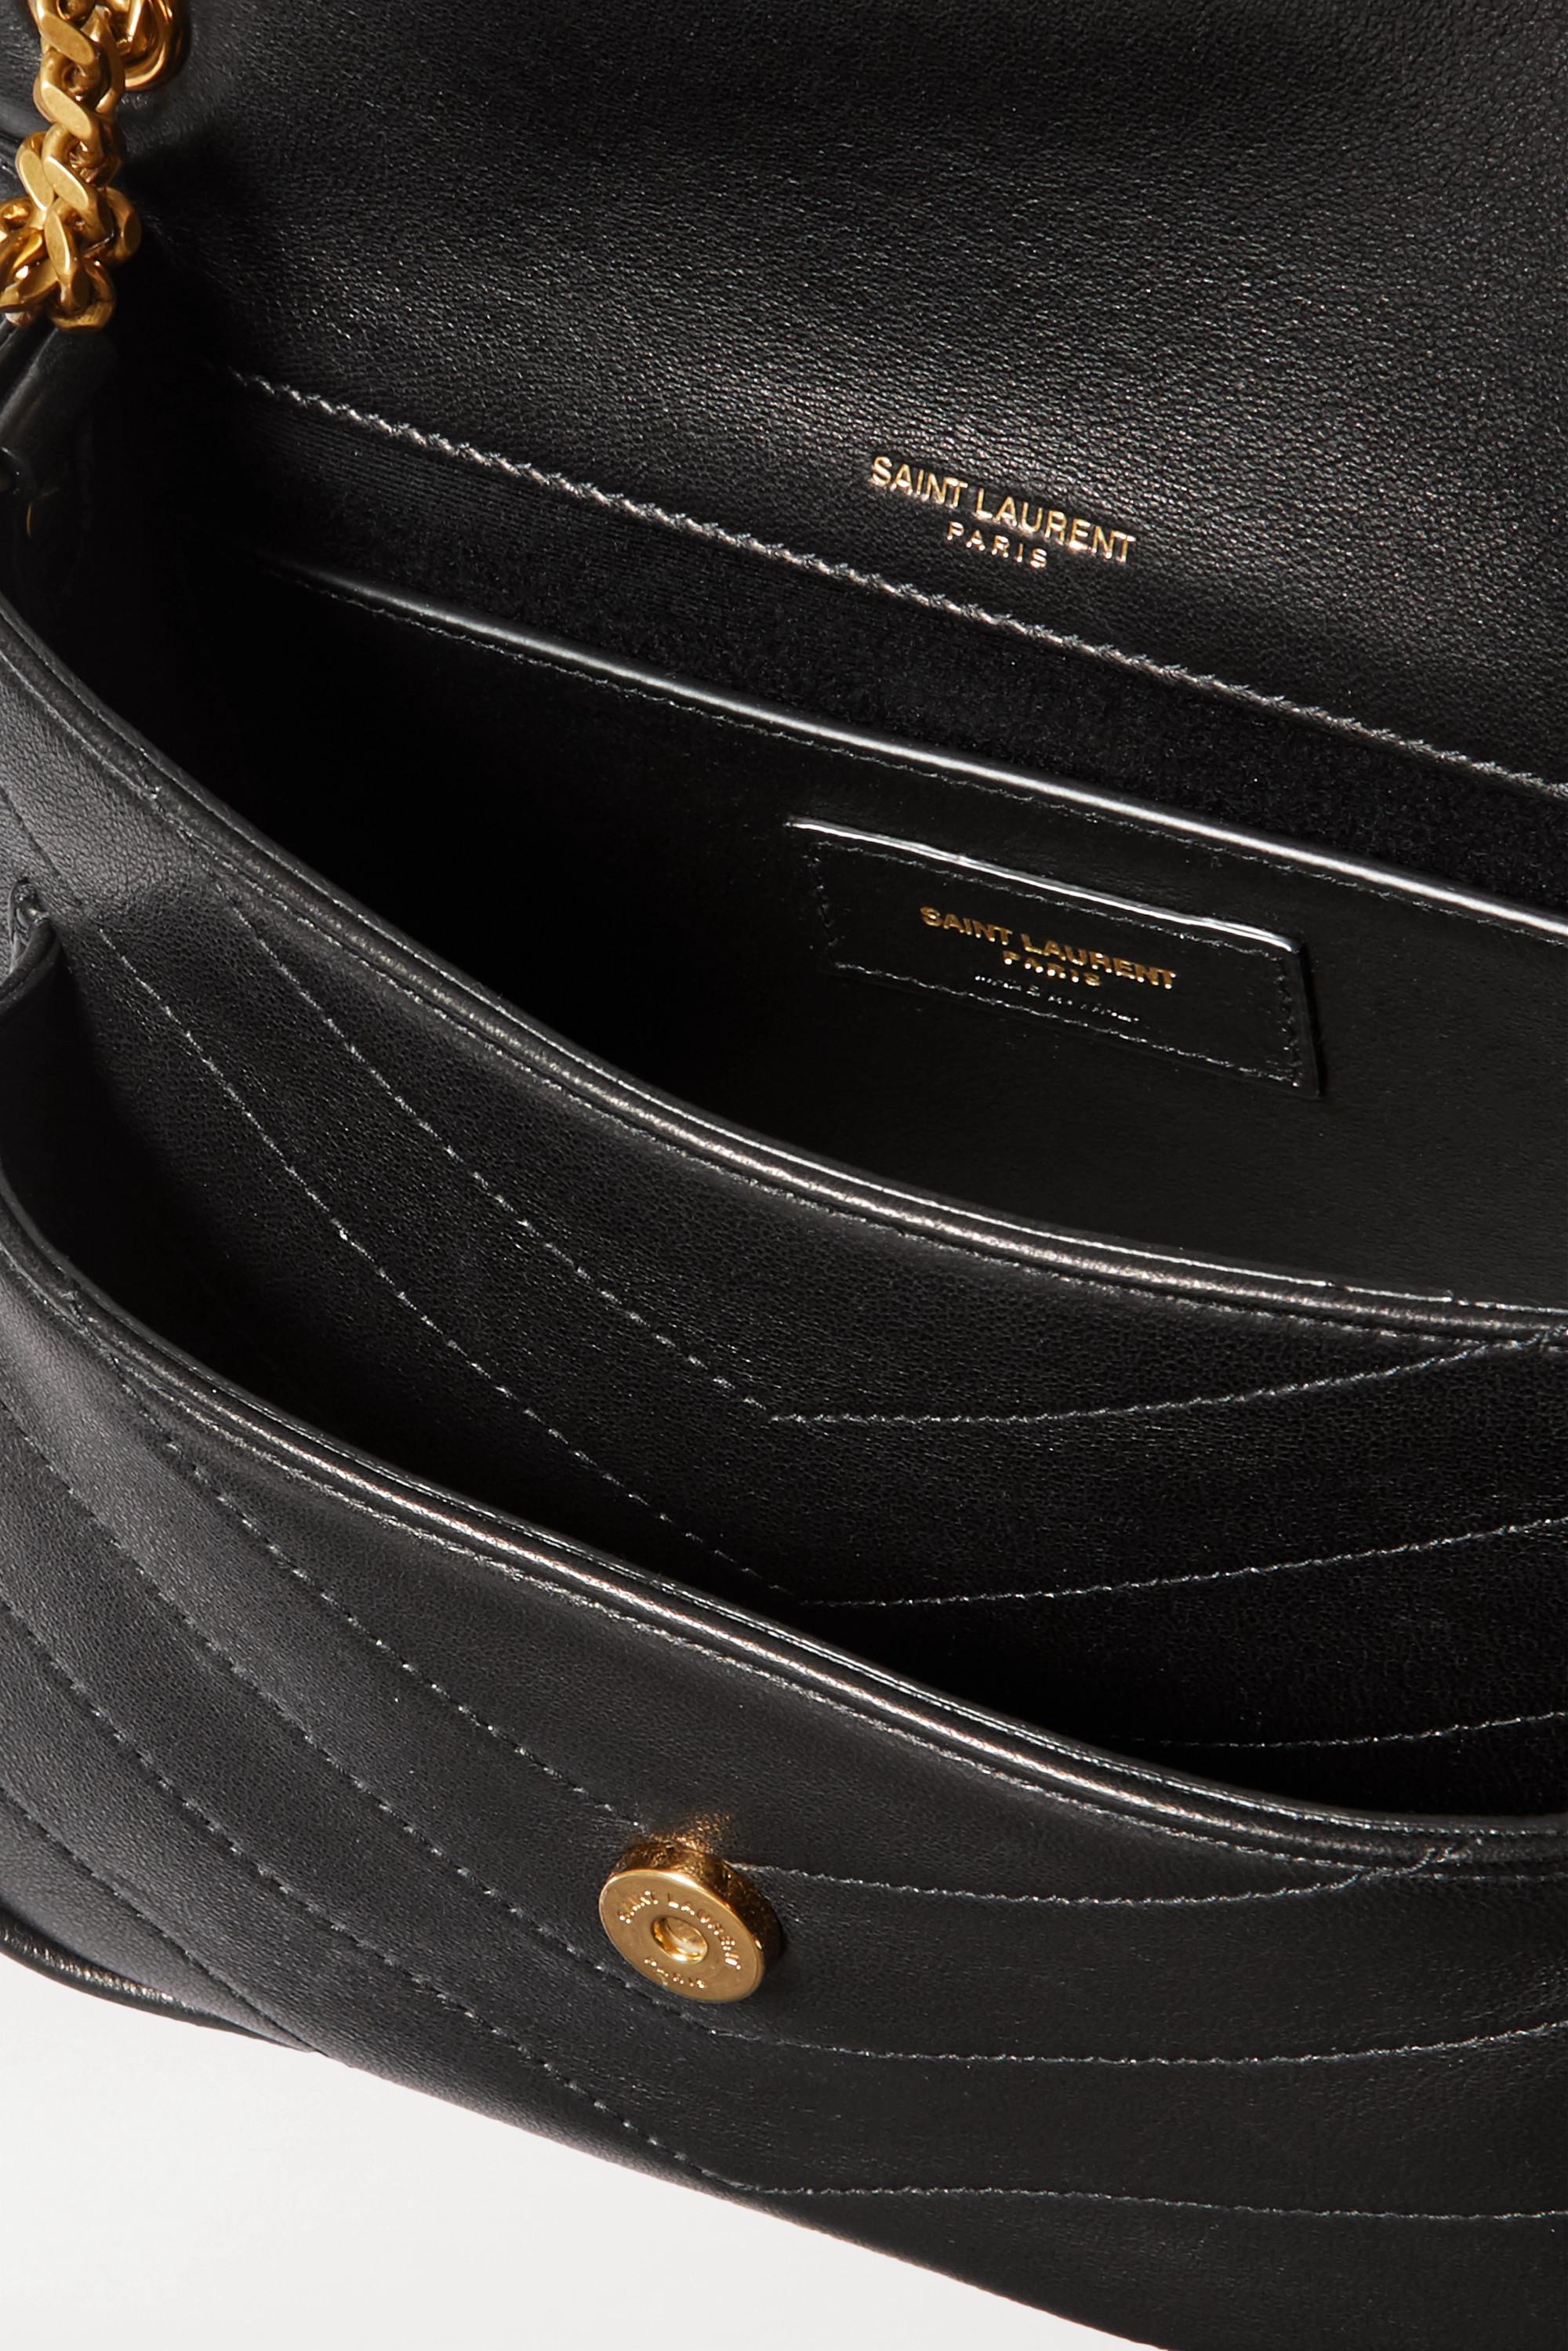 SAINT LAURENT Niki mini quilted leather shoulder bag